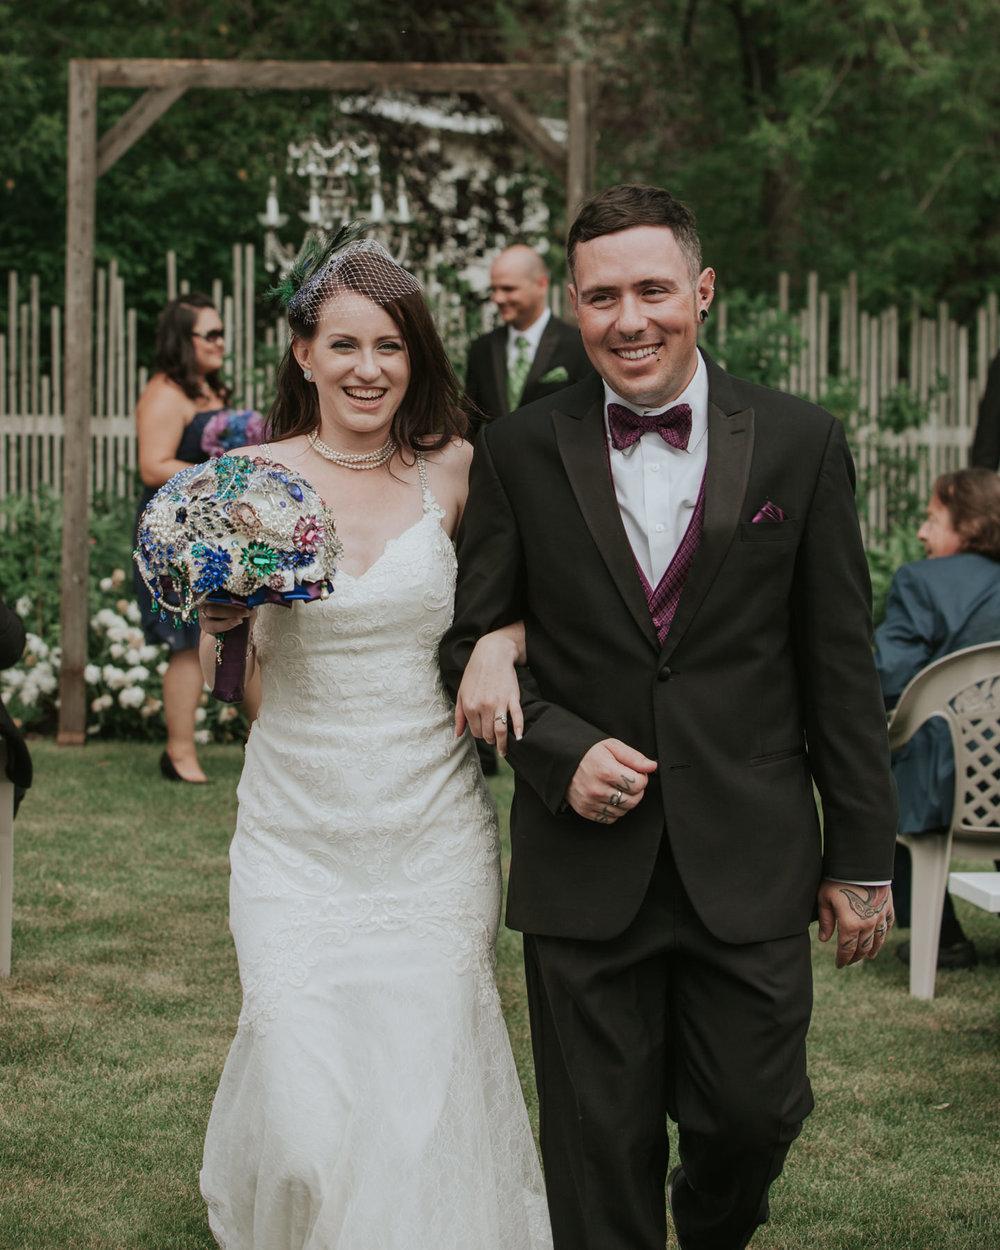 Vancouver Wedding Photographer Pam (36).jpg